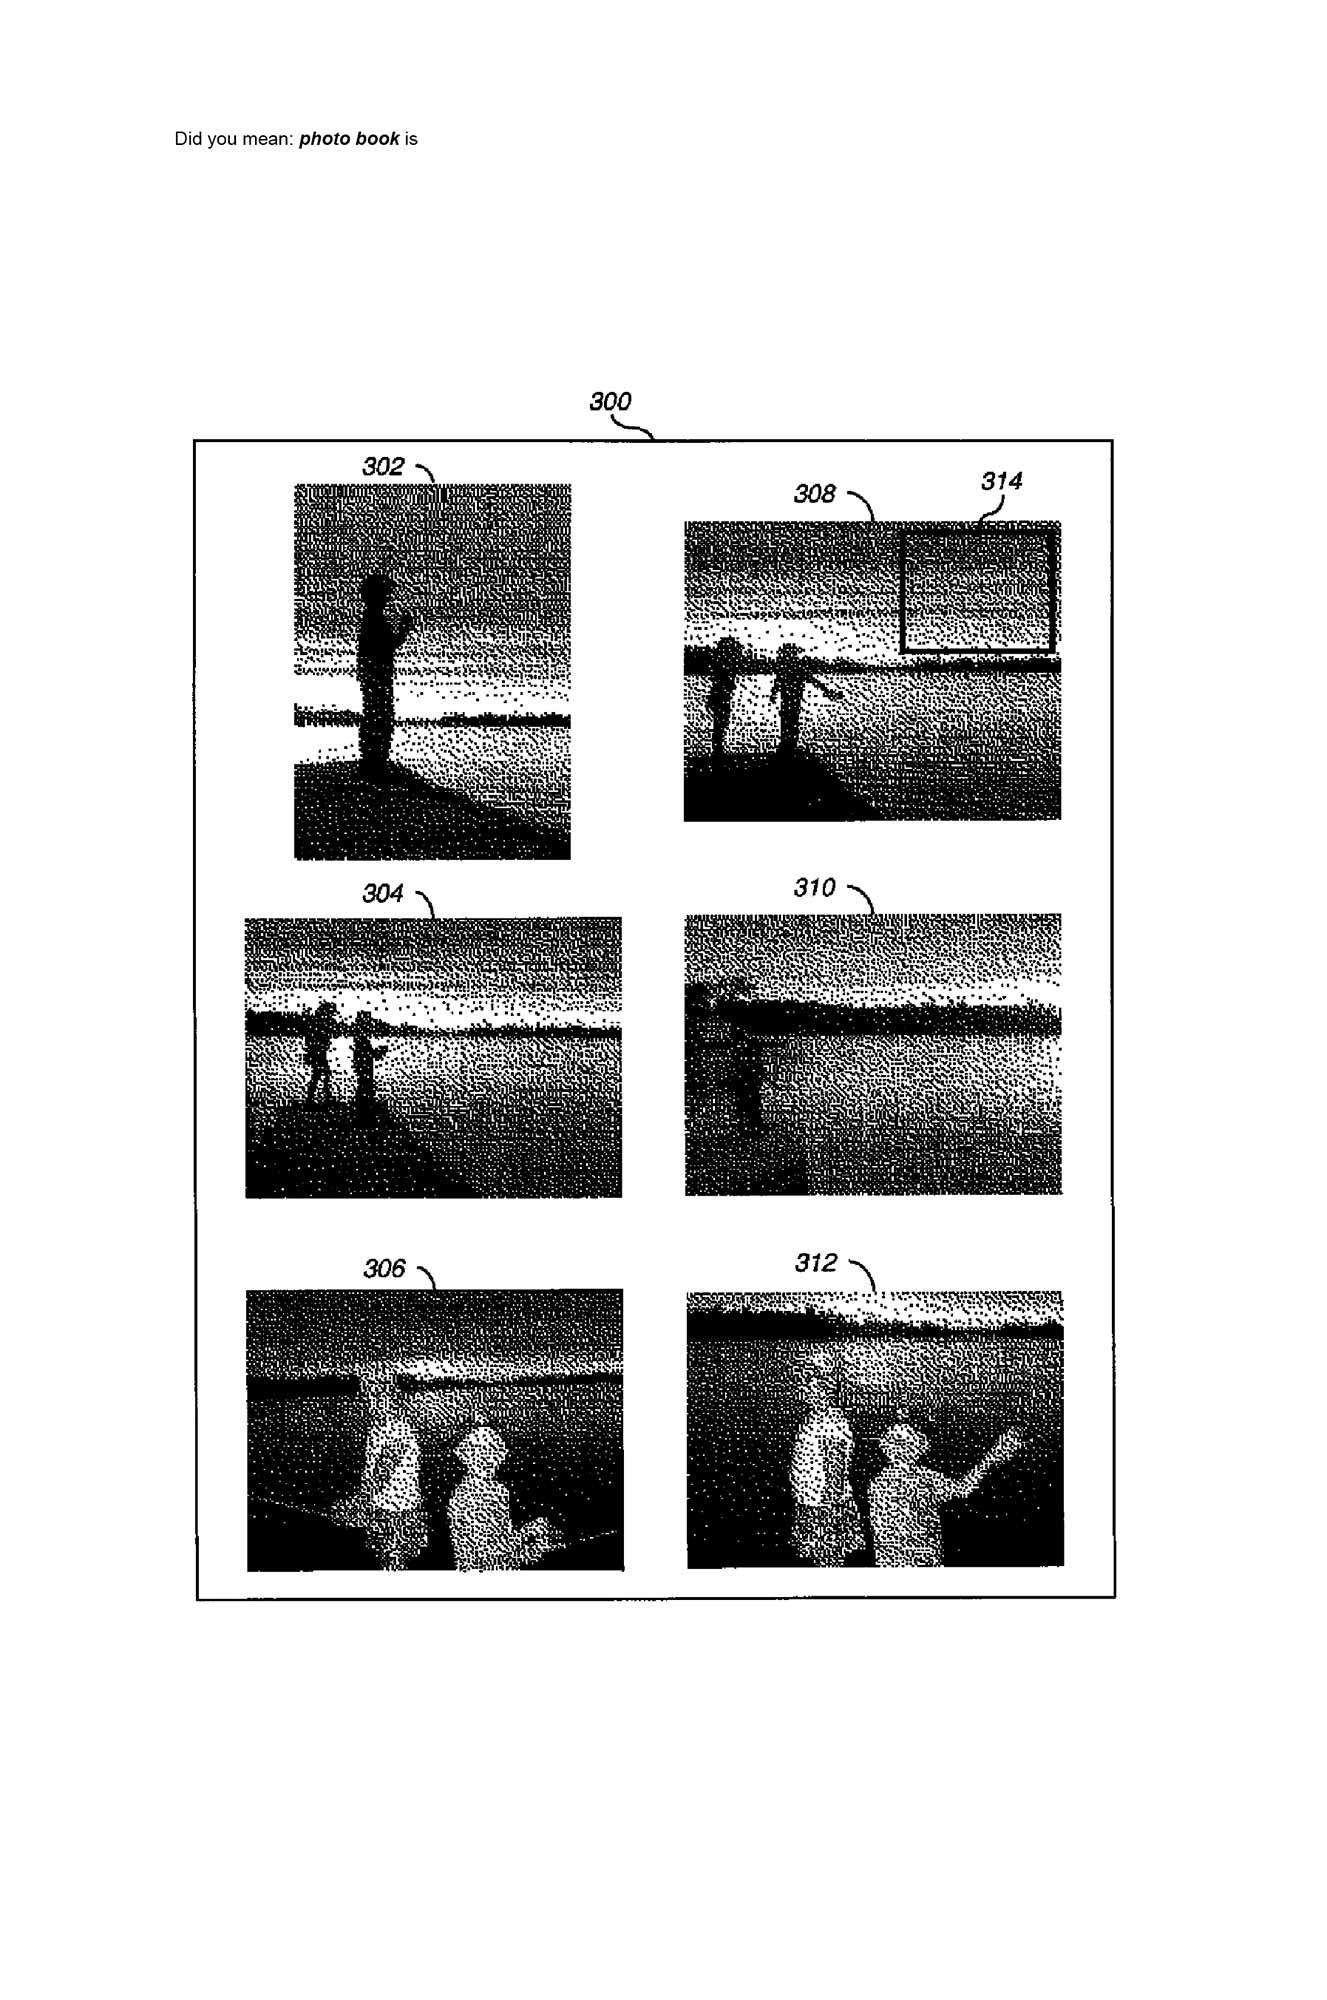 msdm-photobook-is-p457